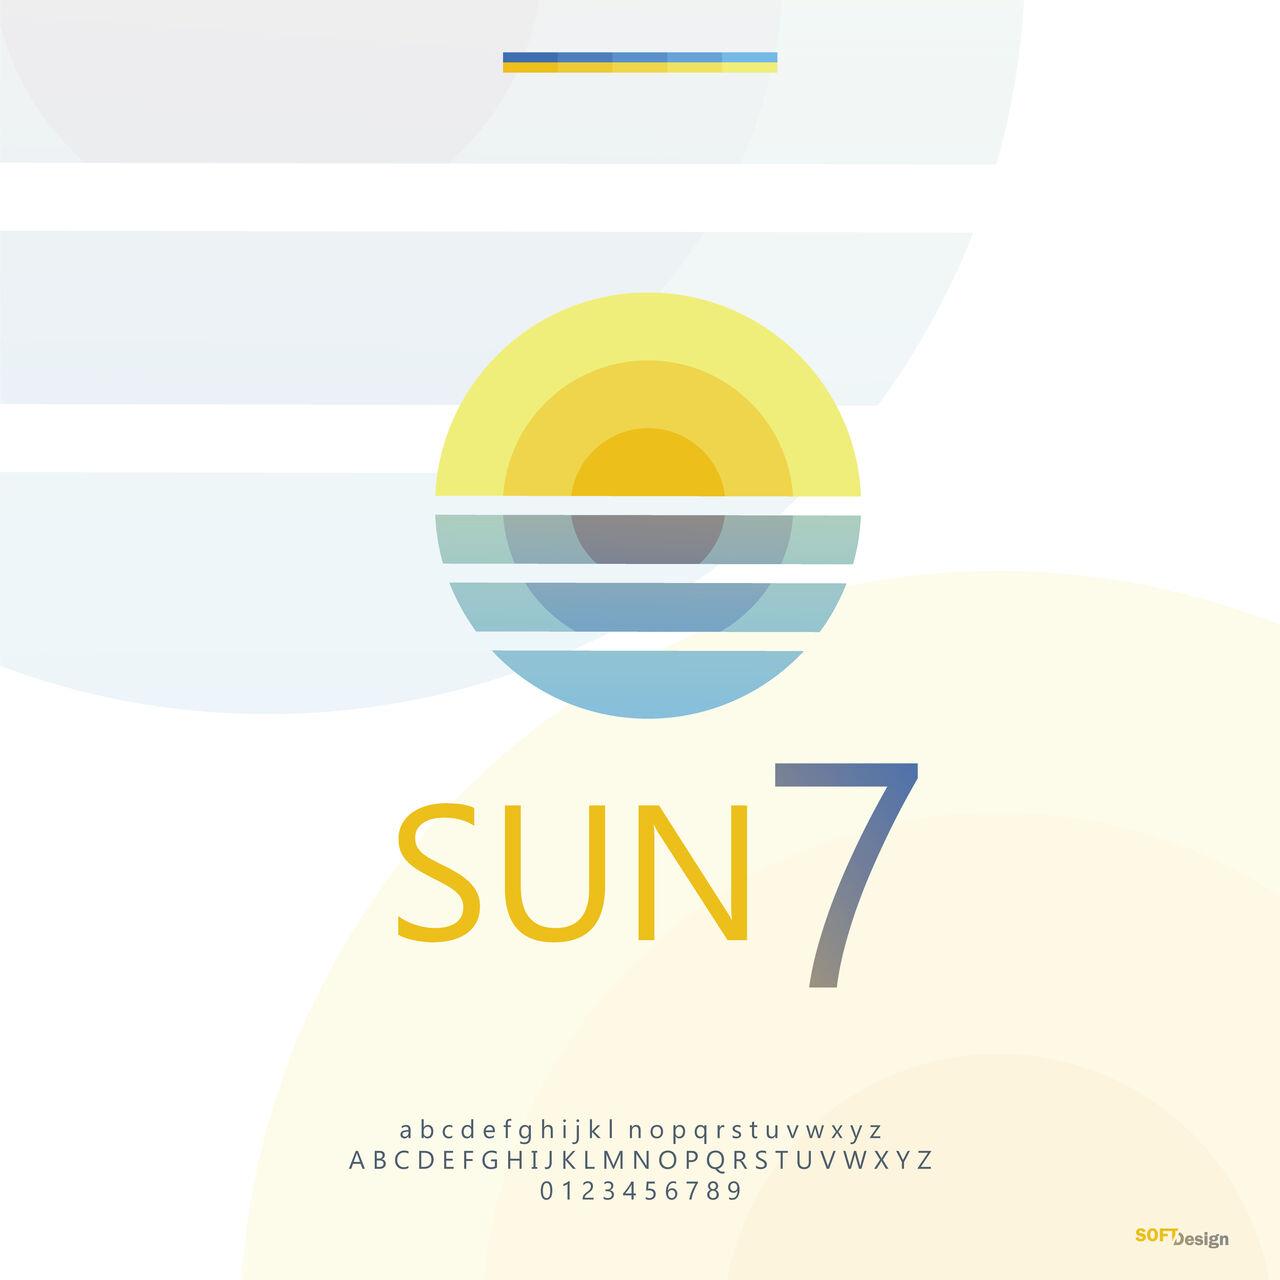 SUN7 (SUNSET)